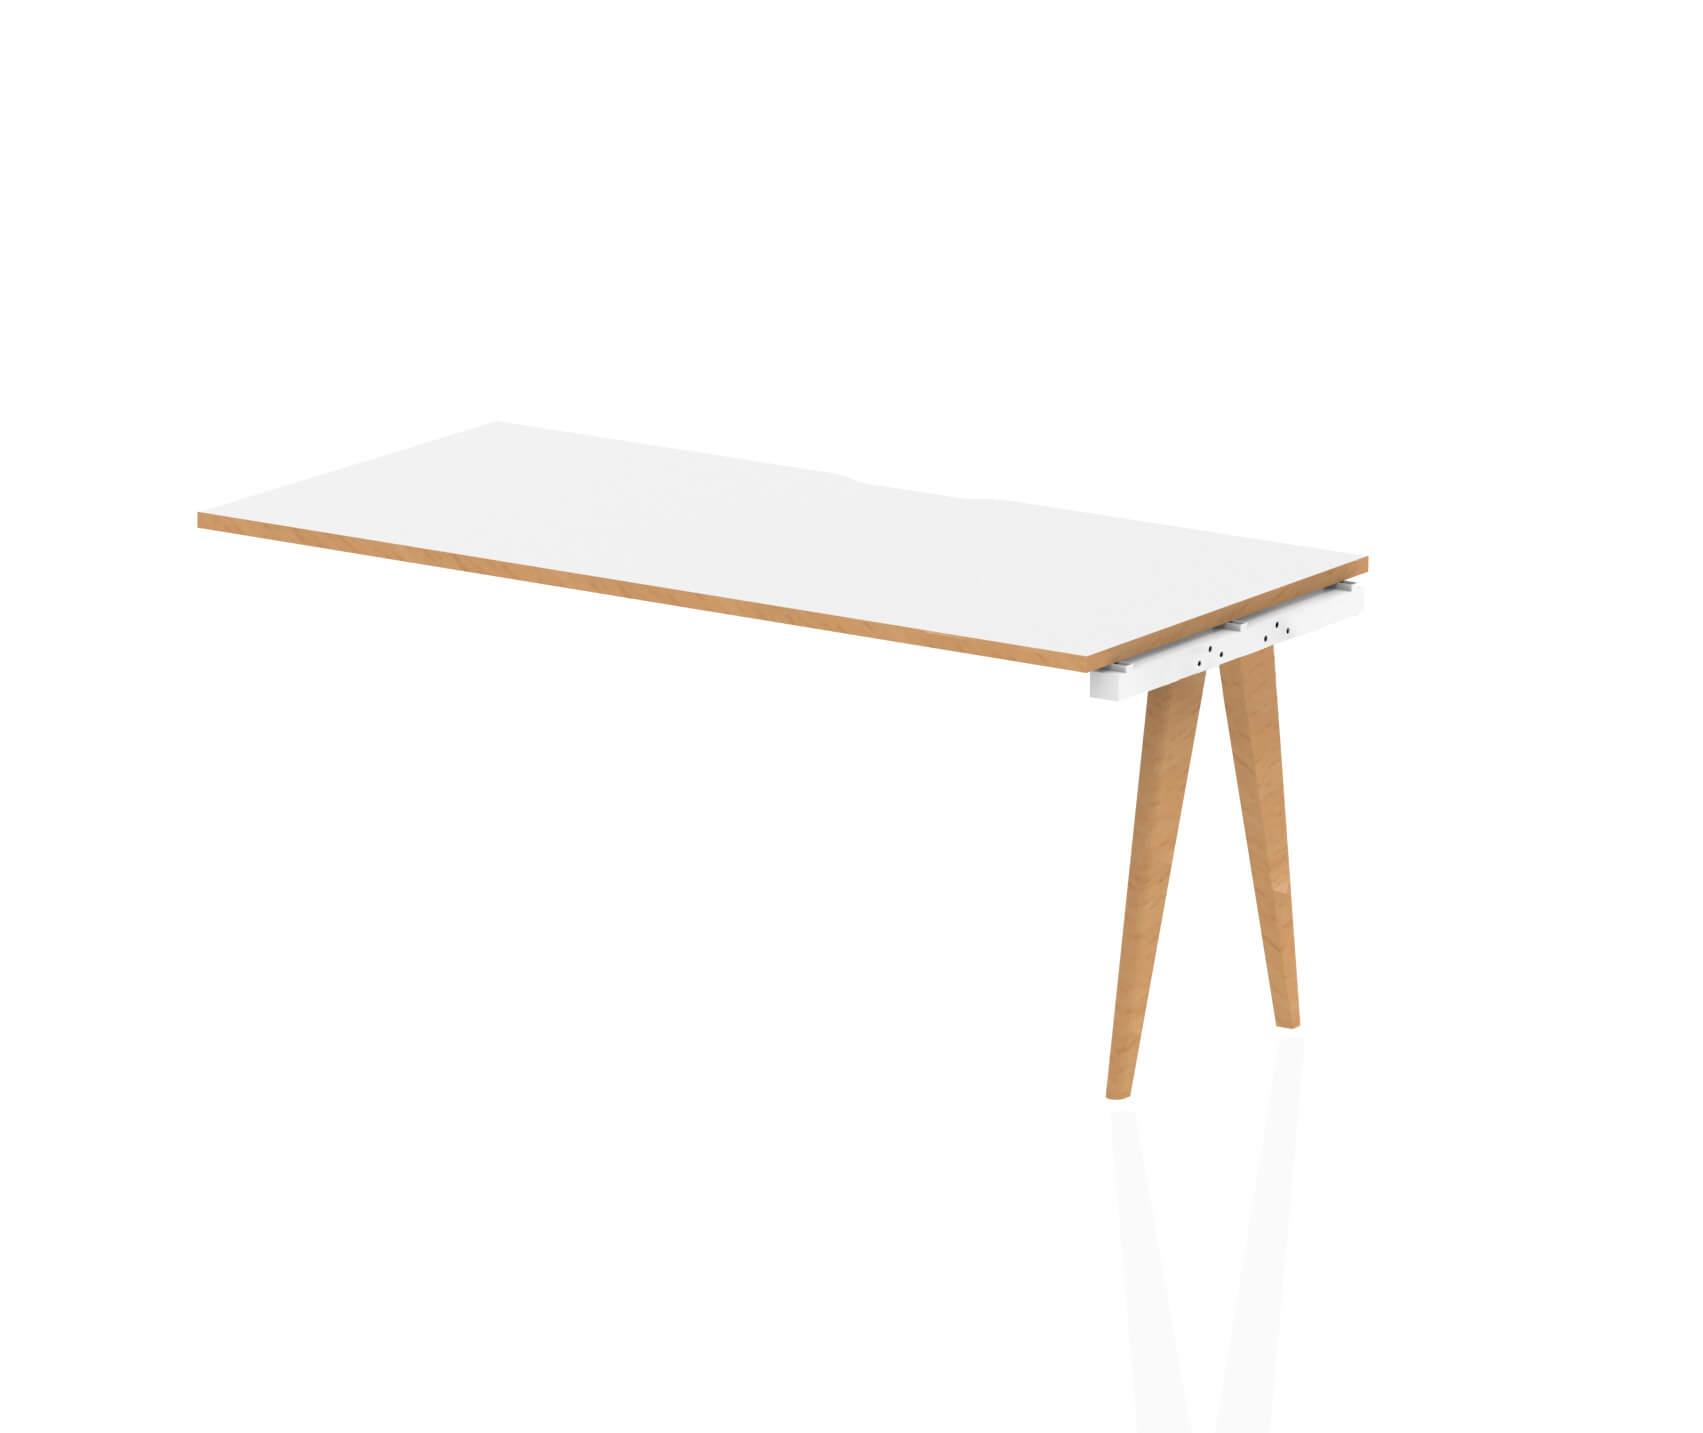 Oslo Single Ext Kit White Frame Wooden Leg Bench Desk 1600 White With Natural Wood Edge